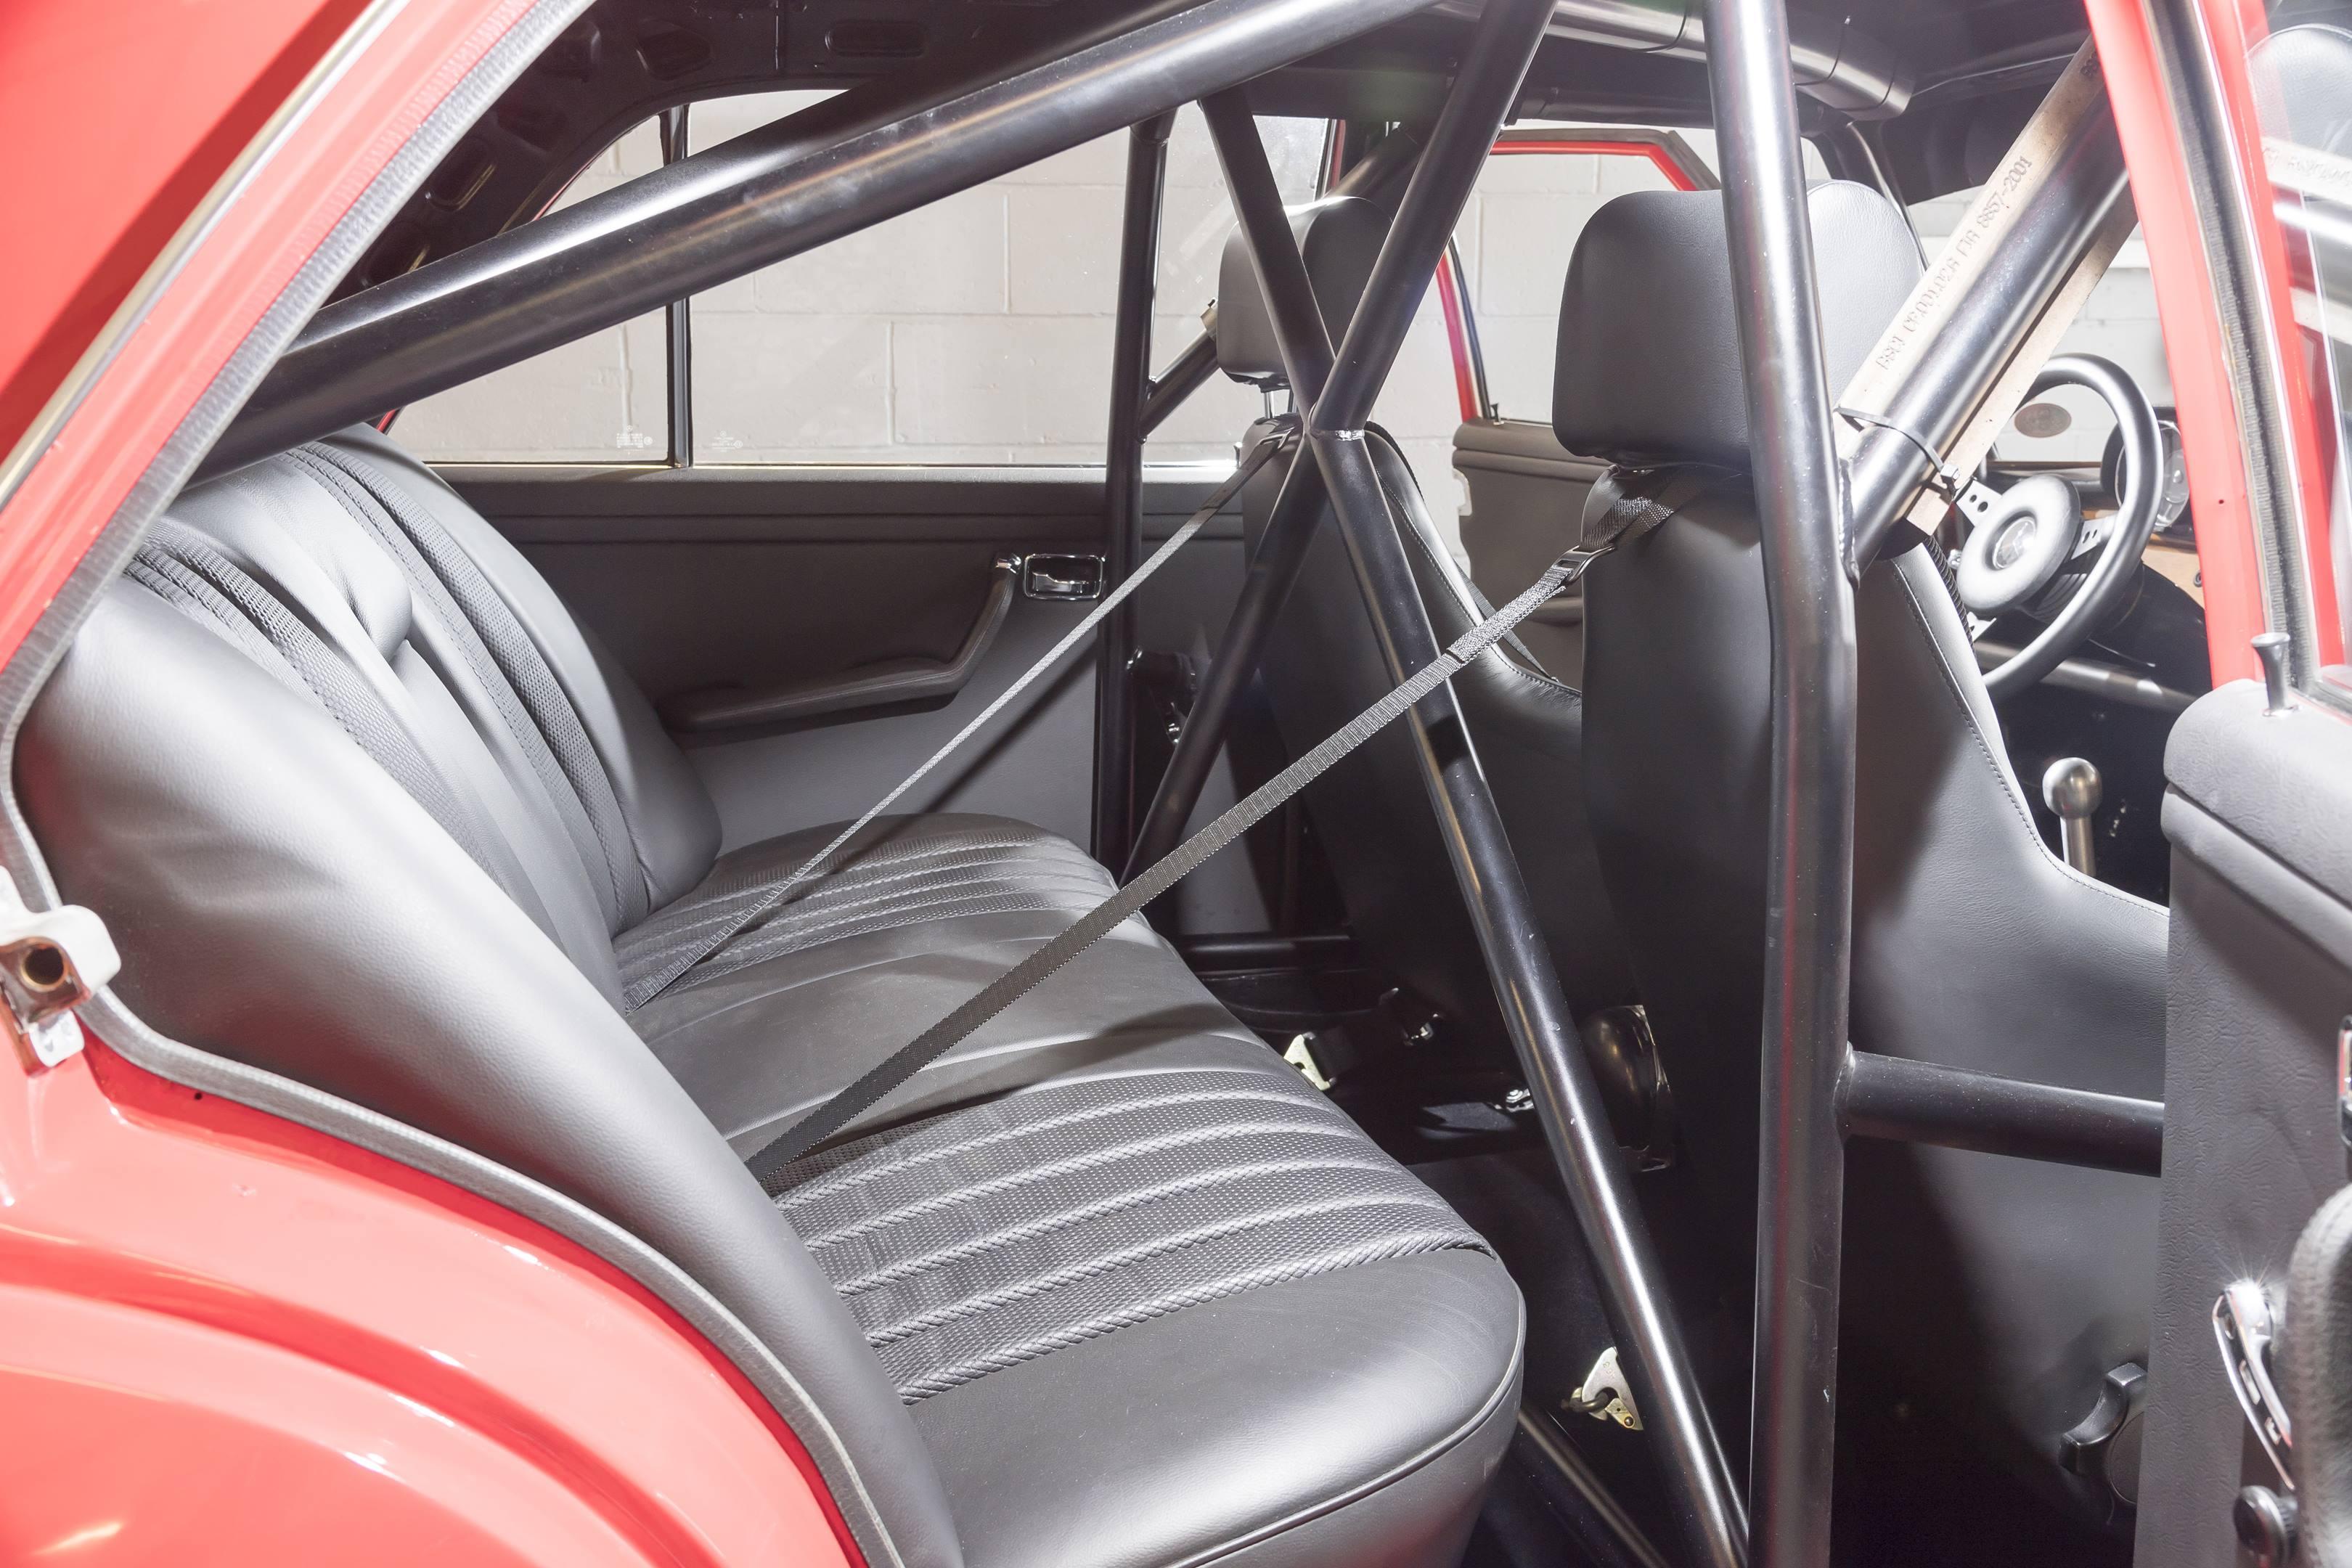 mercedes benz amg 300SEL 6.3 rear seat